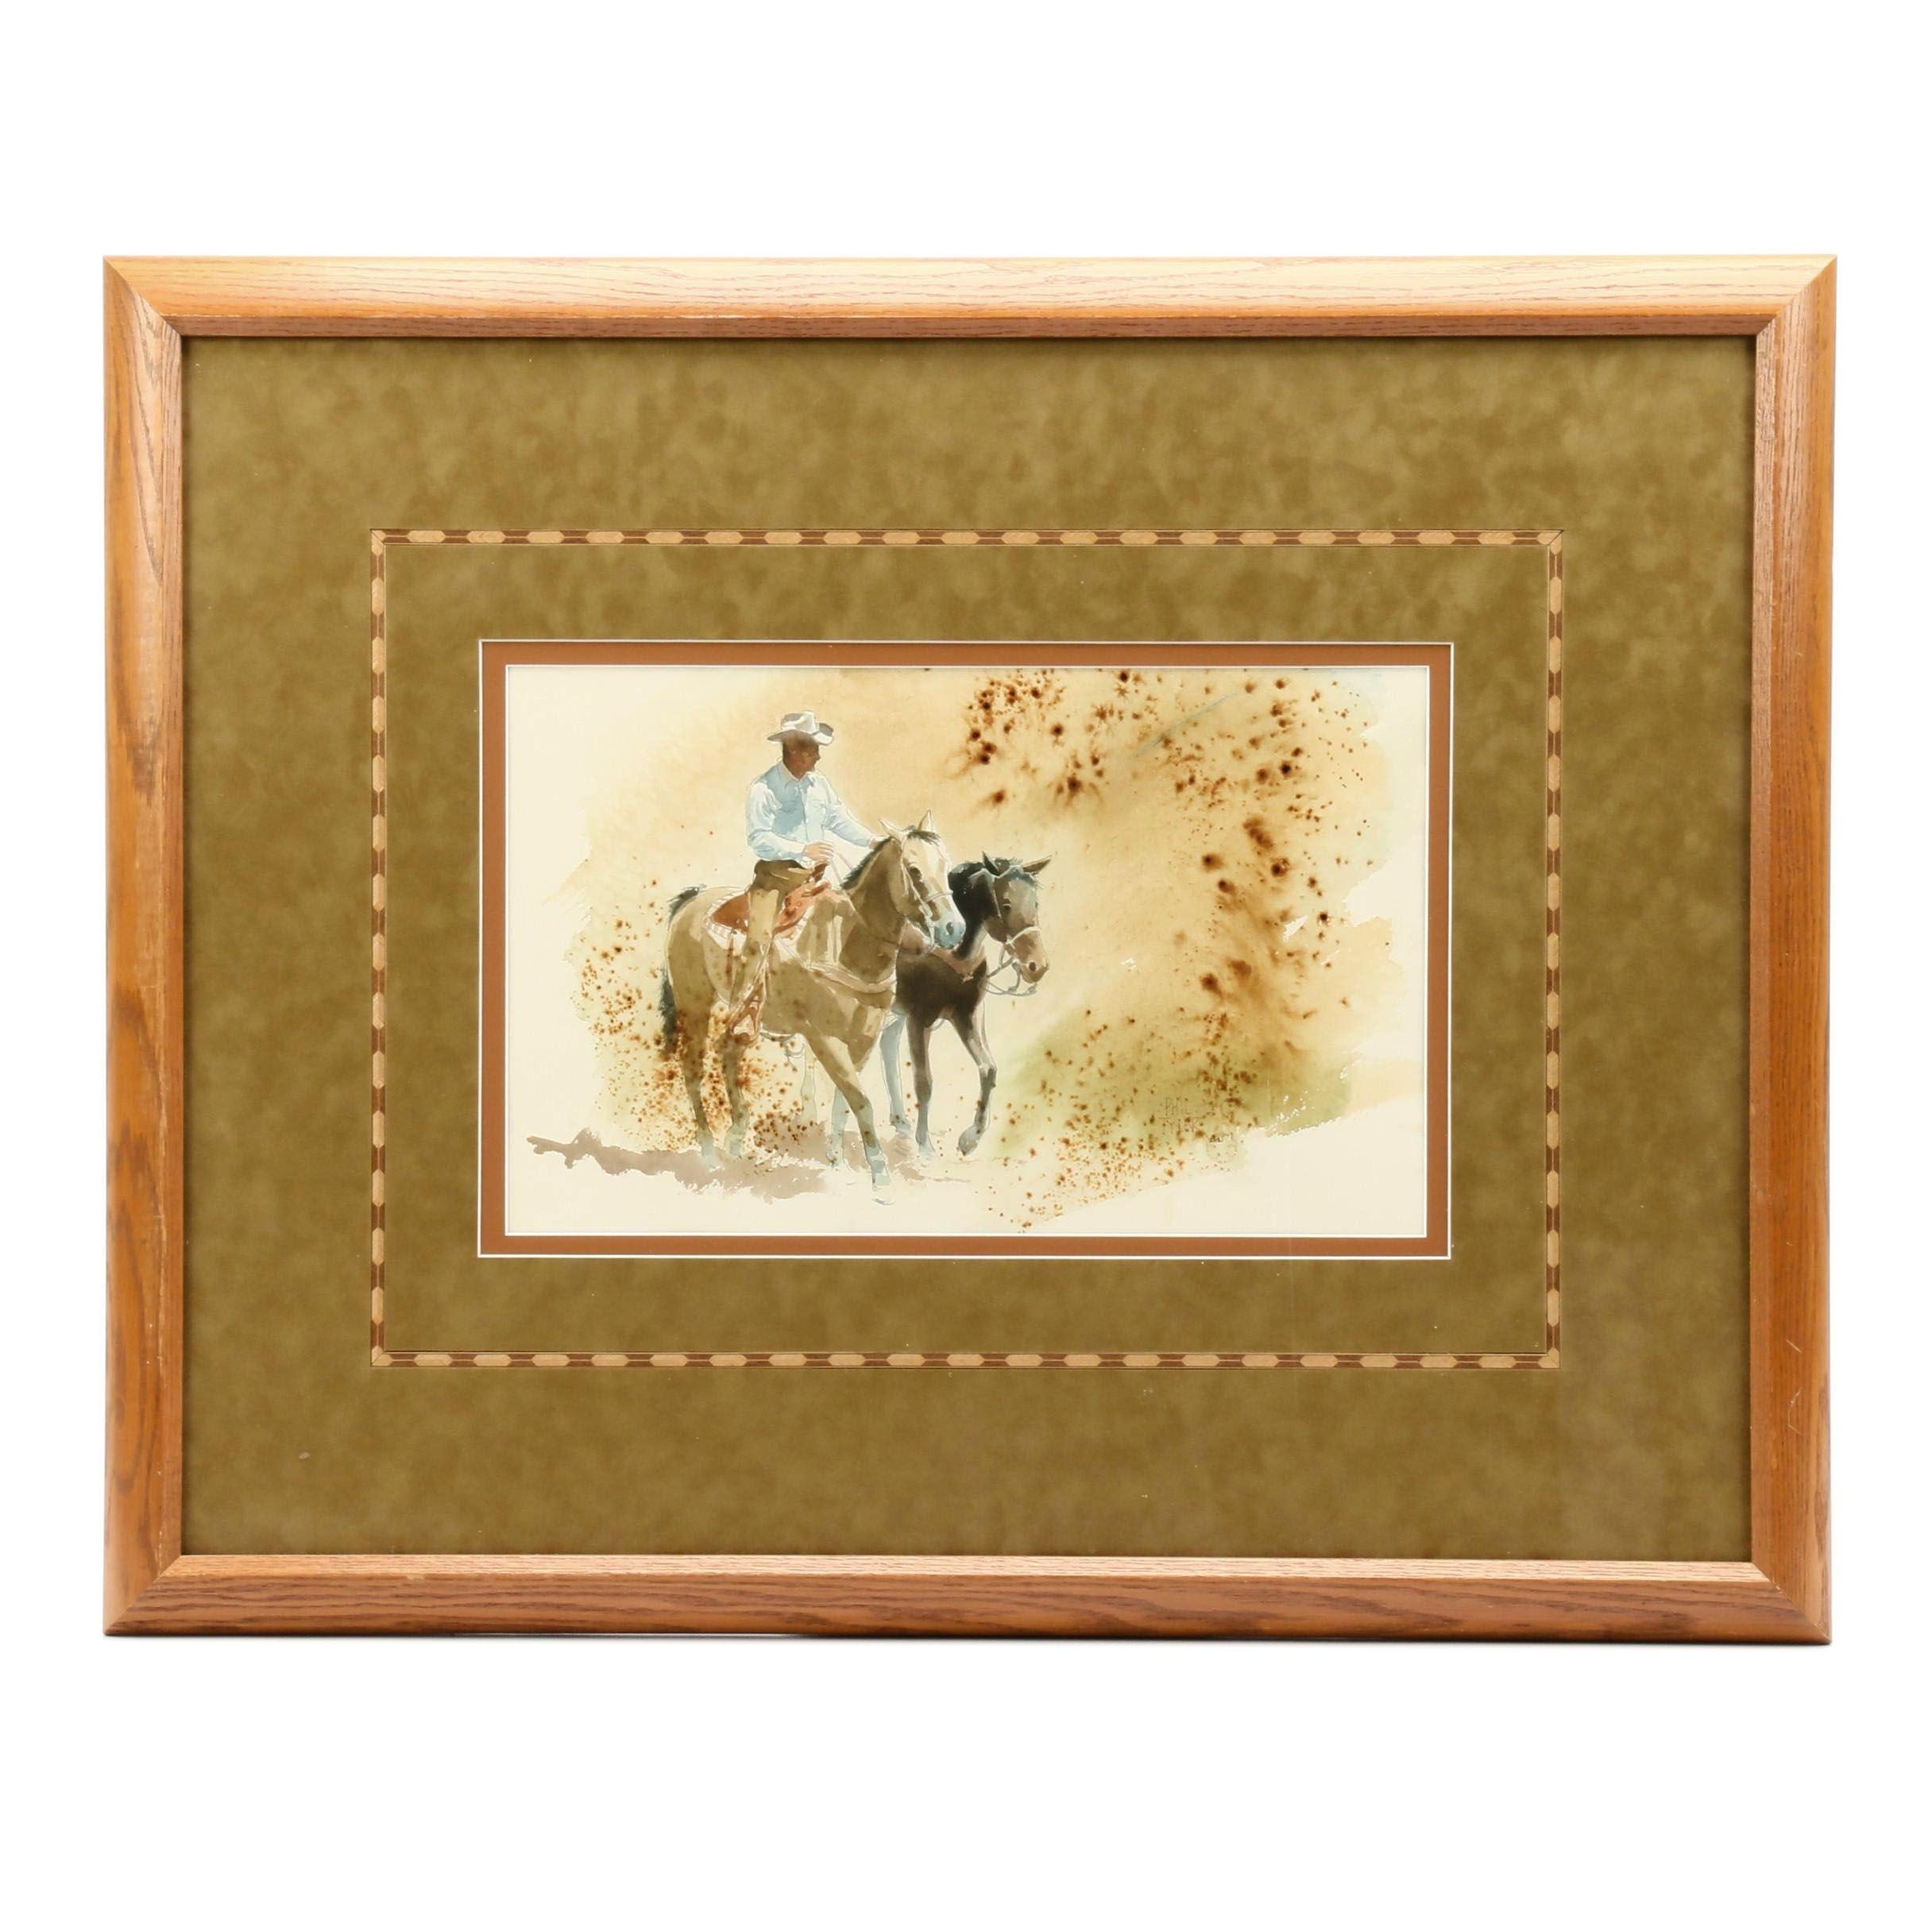 Phil Tyler Watercolor Painting of Cowboy on Horseback